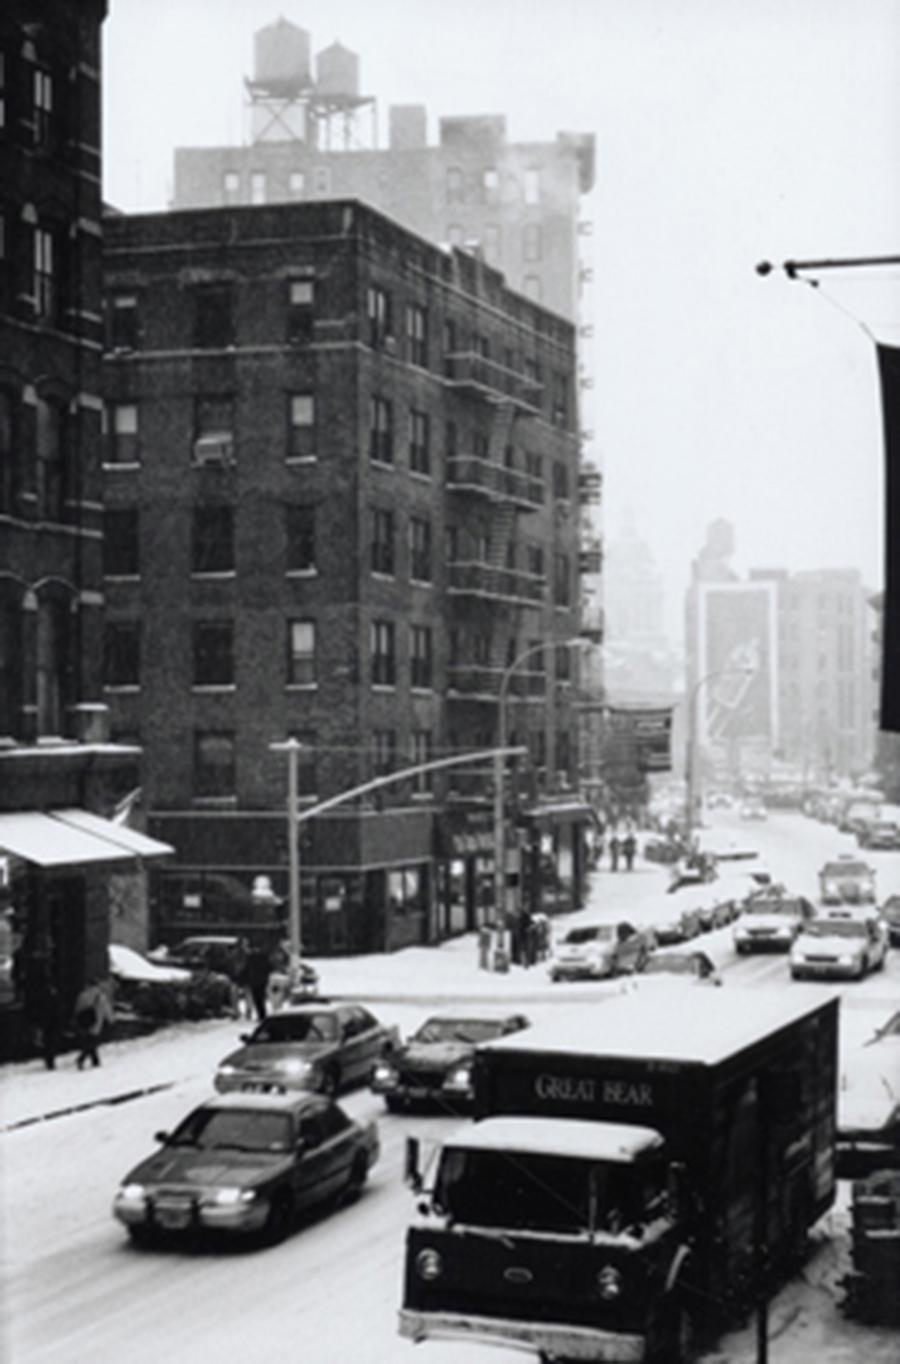 New-York--2.jpg